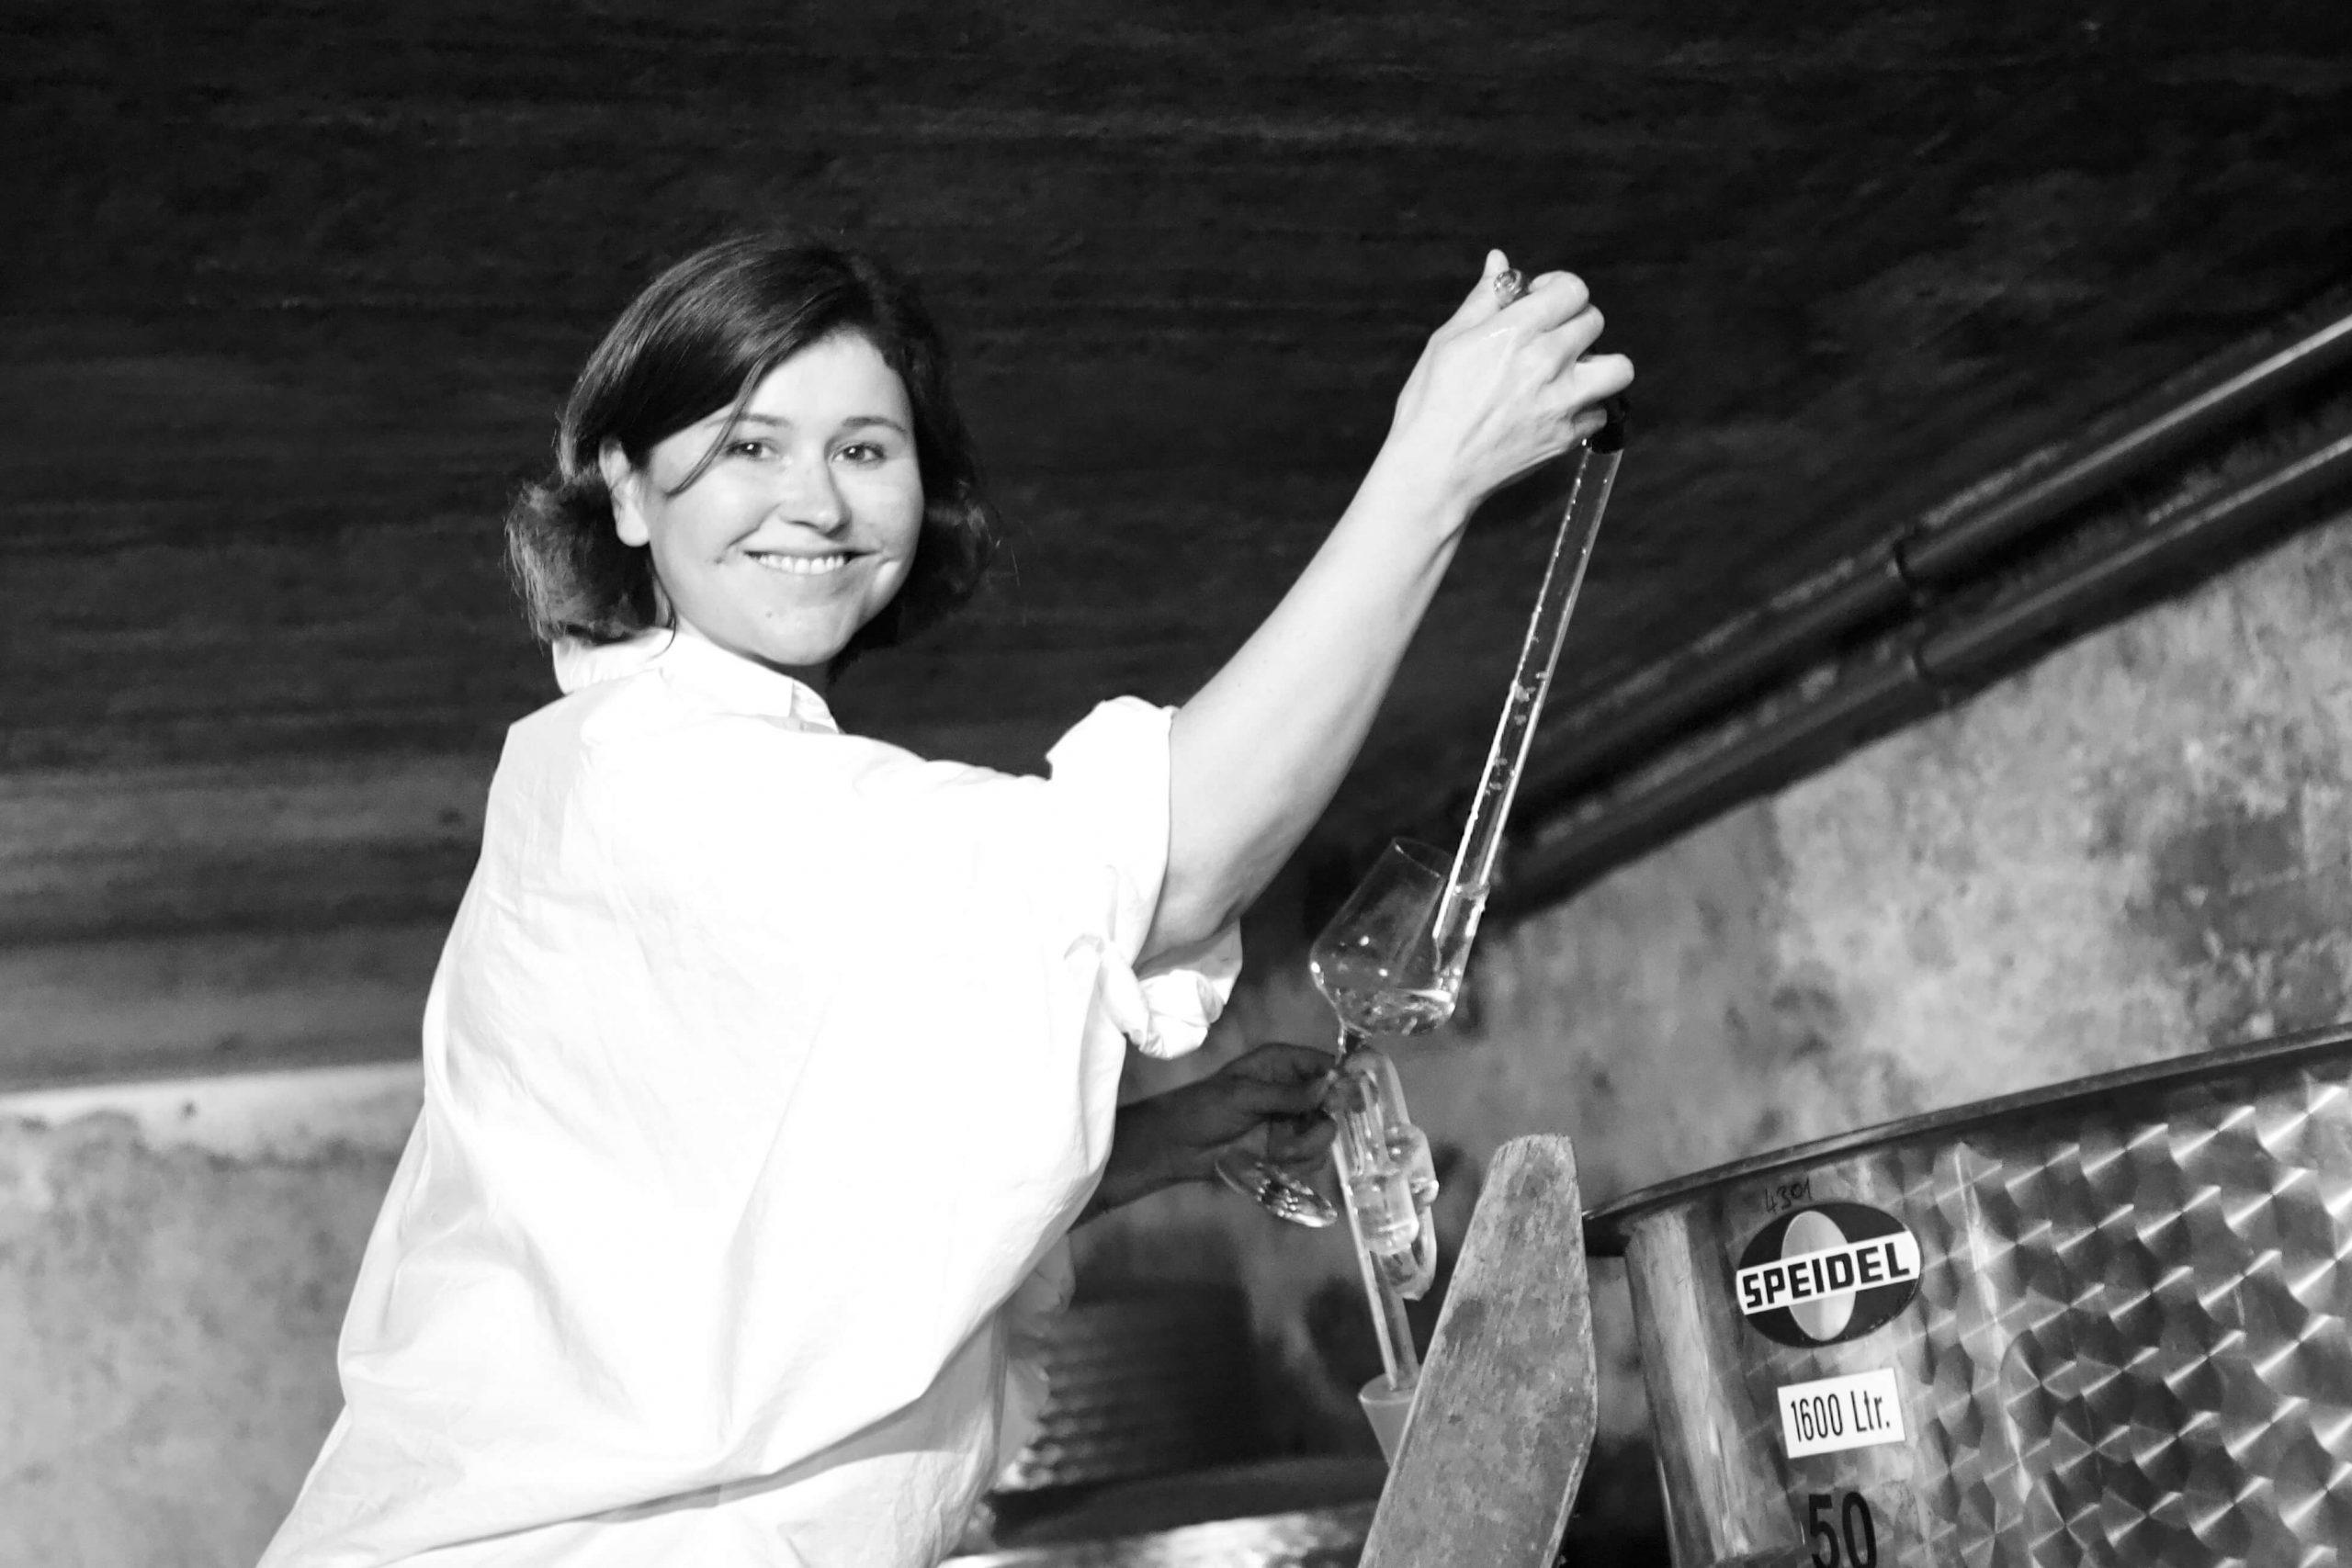 Wechsler winemaker